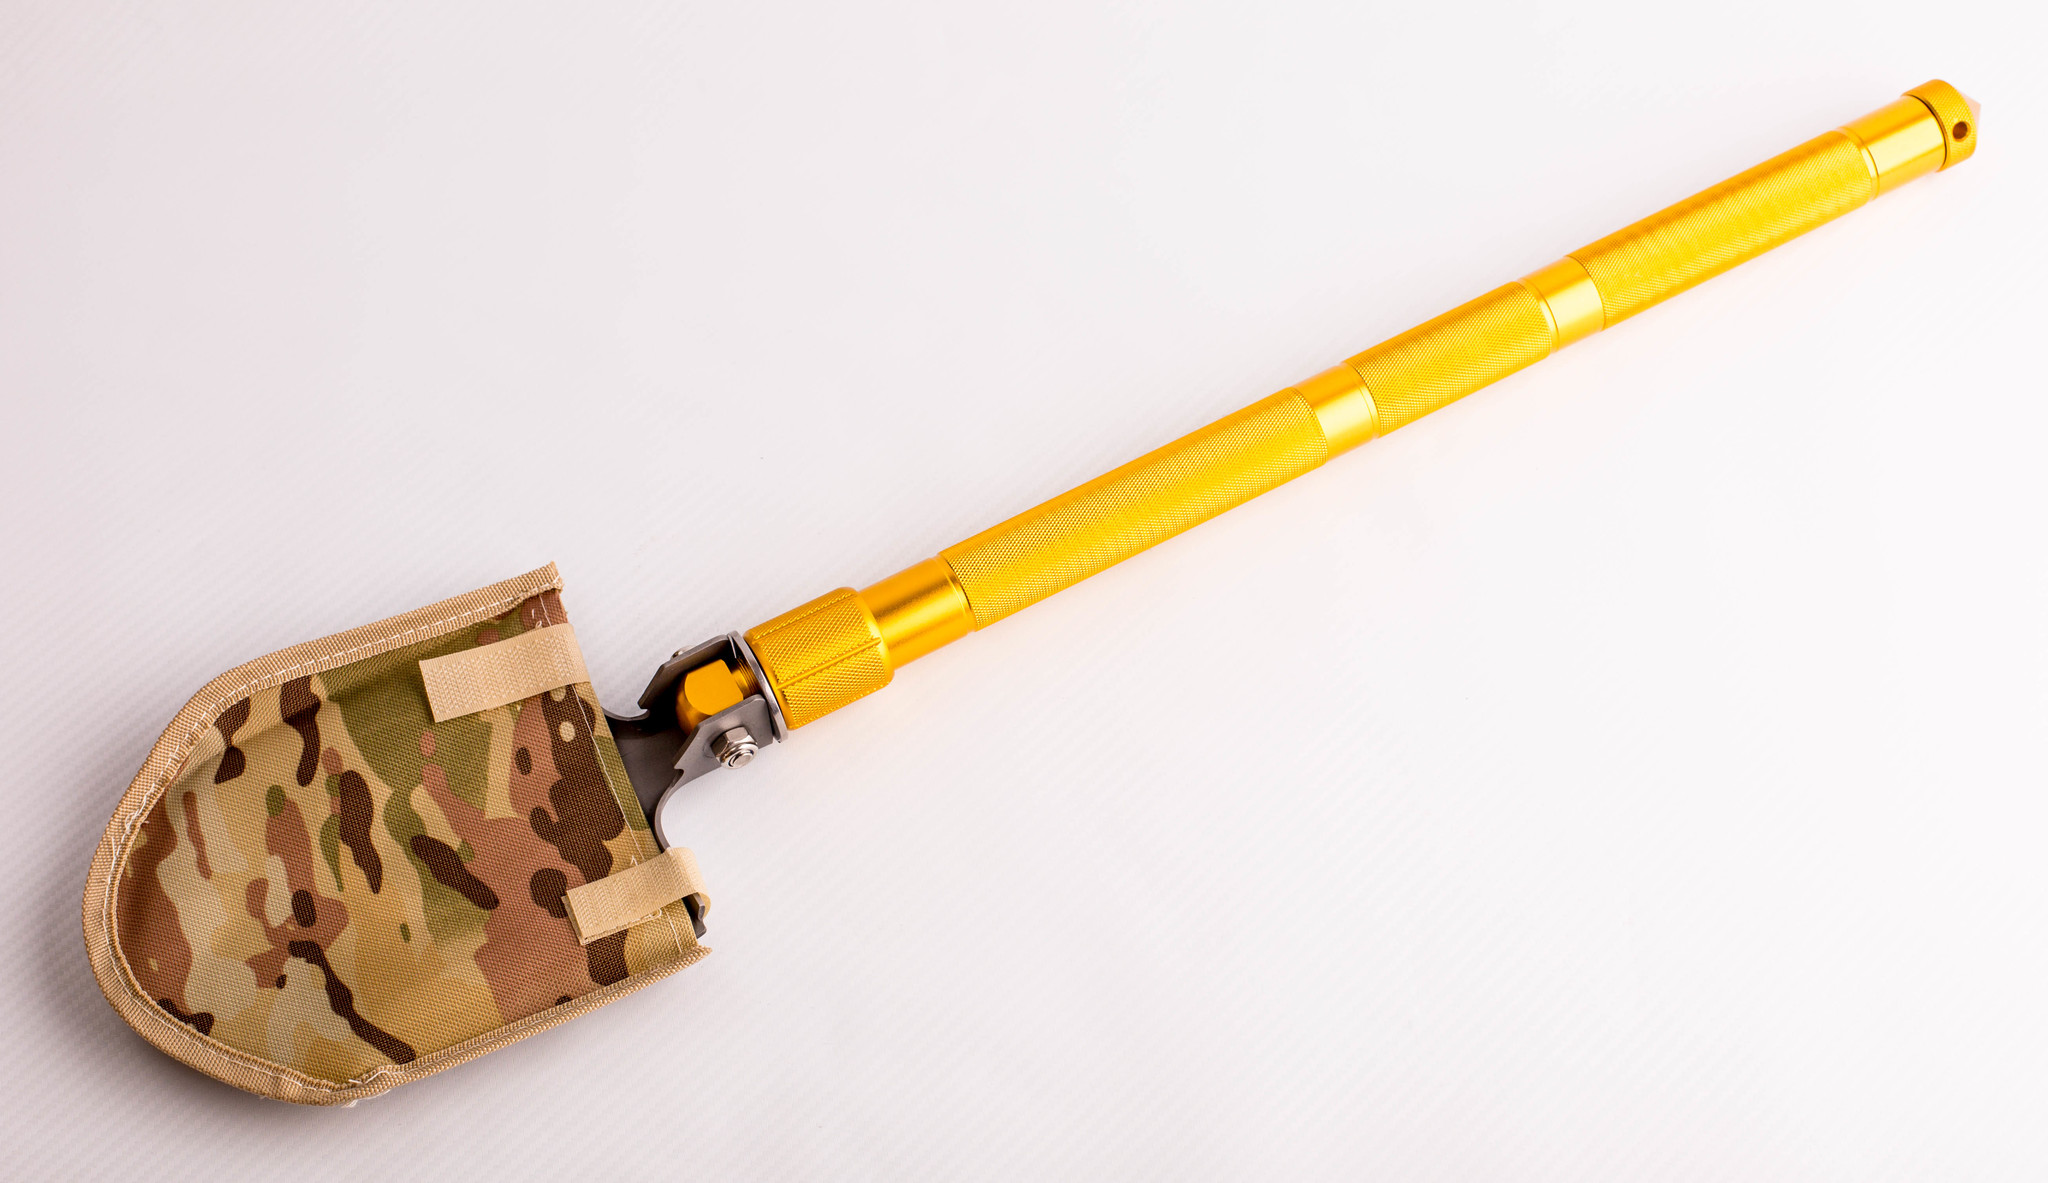 Фото 13 - Многофункциональная лопата, золотистая рукоятка от Noname